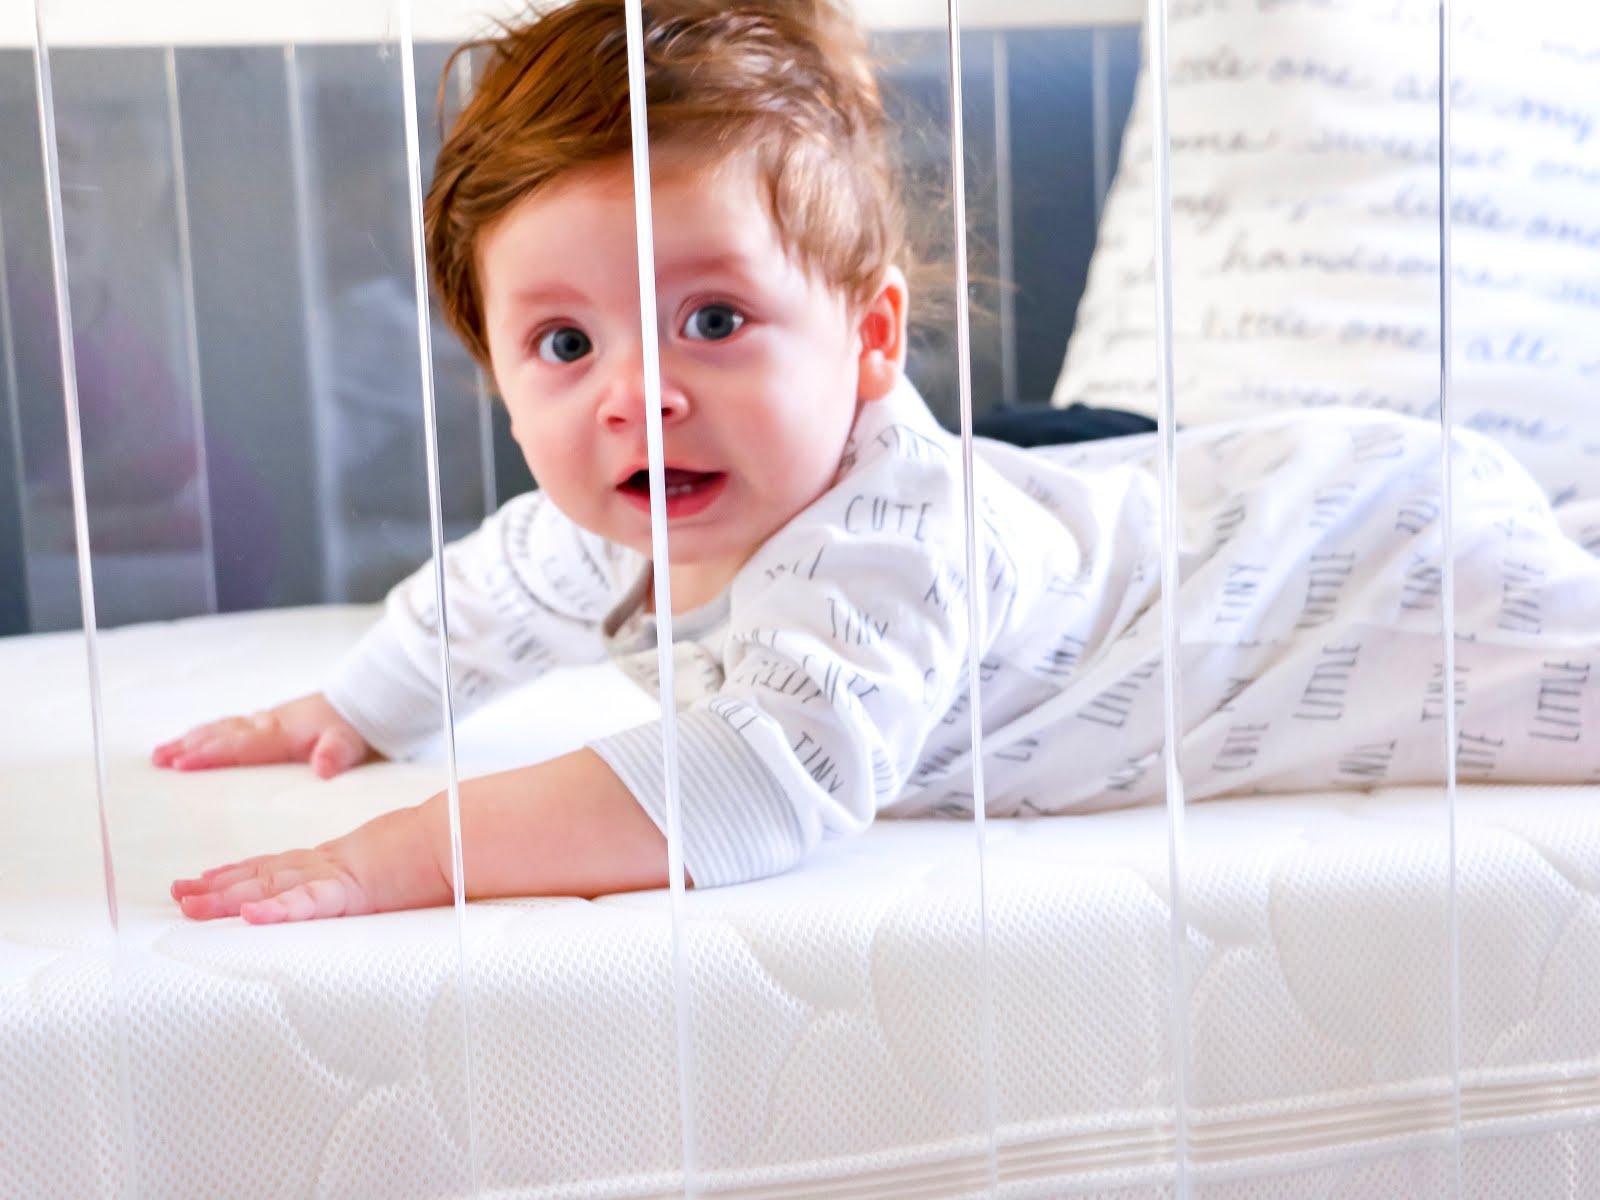 Newton-Baby-Crib-Mattress-Review-Vivi-Brizuela